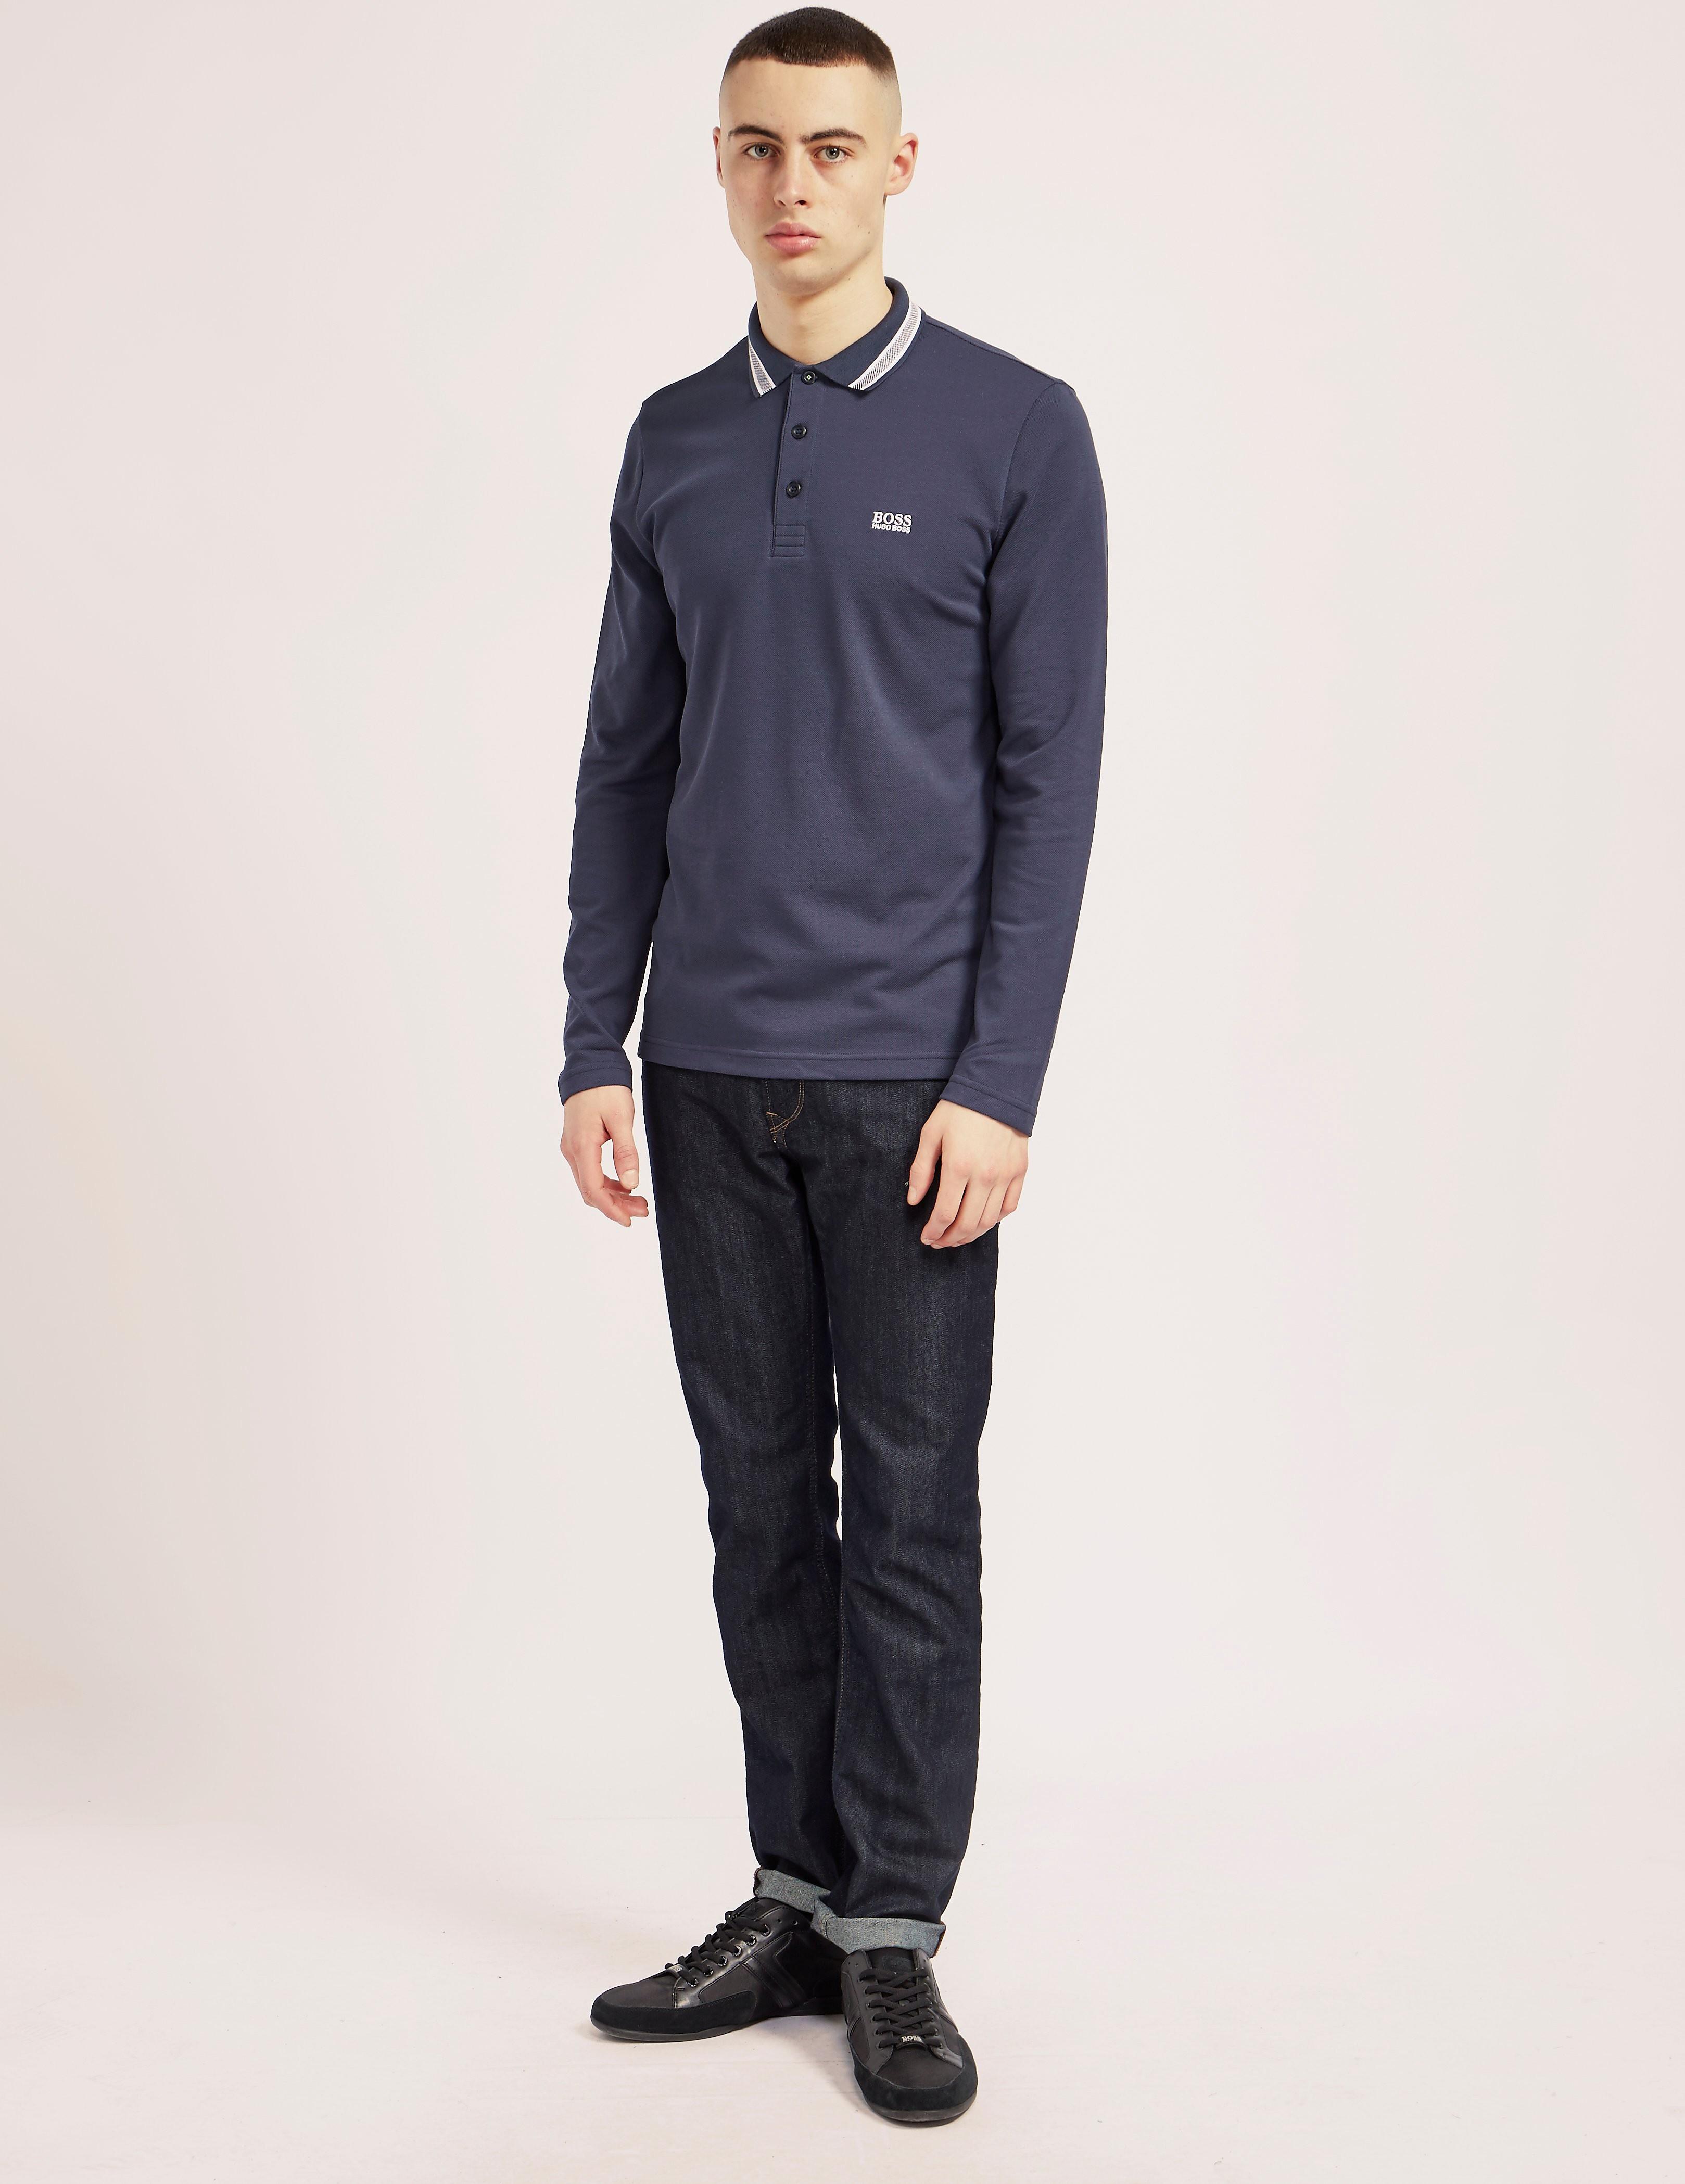 BOSS Green Plisy Long Sleeve Polo Shirt